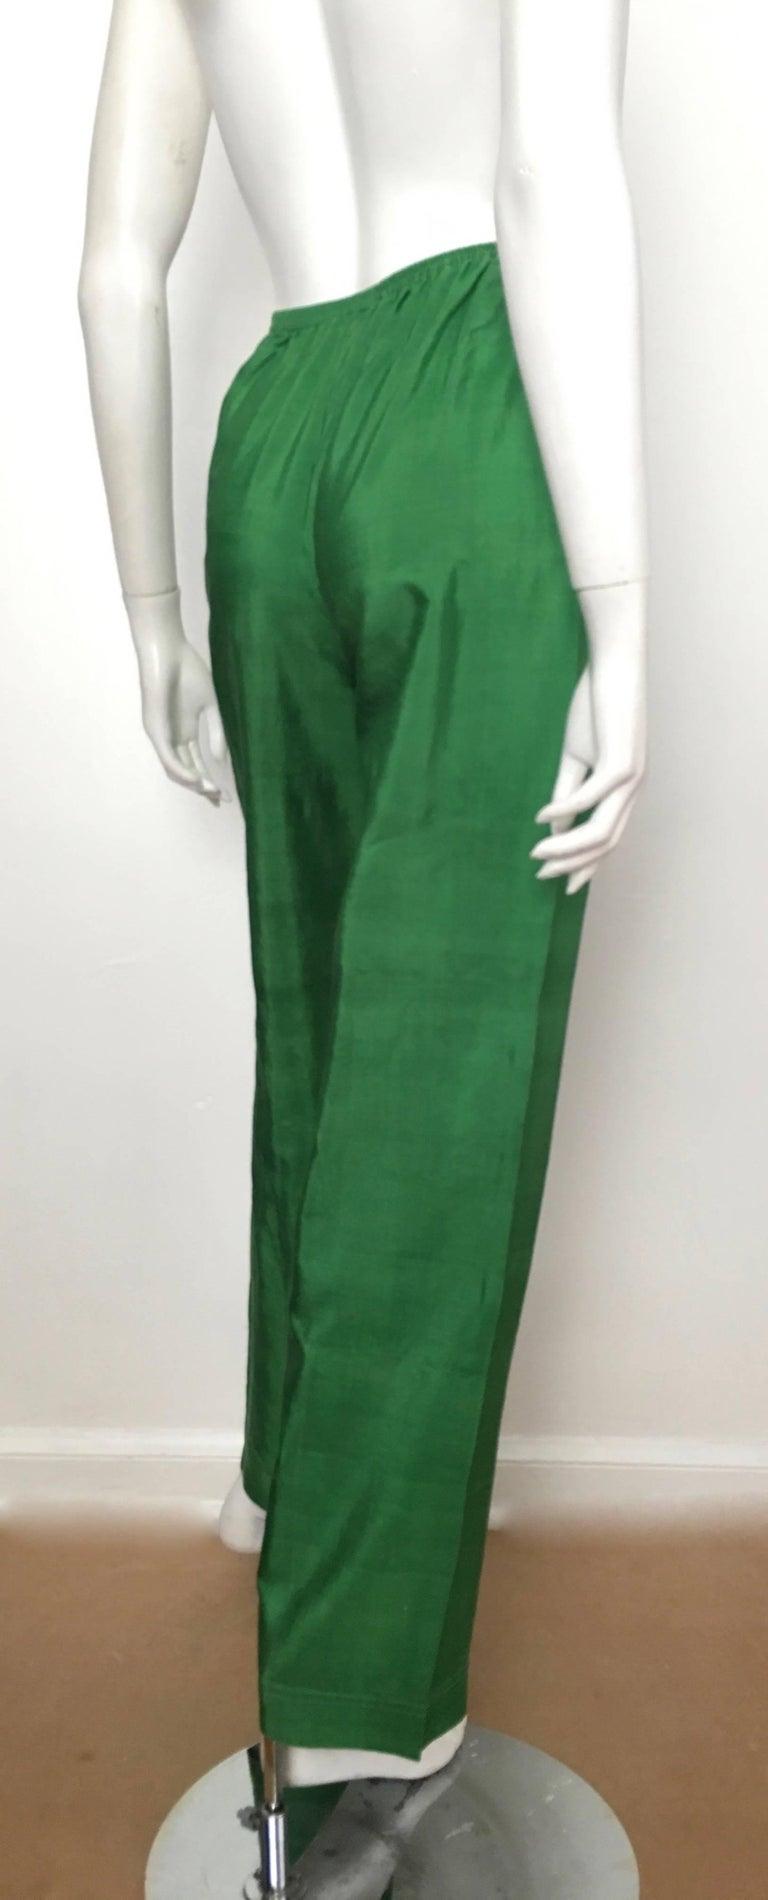 df9452290e91 Saint Laurent Rive Gauche 1970s Green Silk Pants Size 4. at 1stdibs